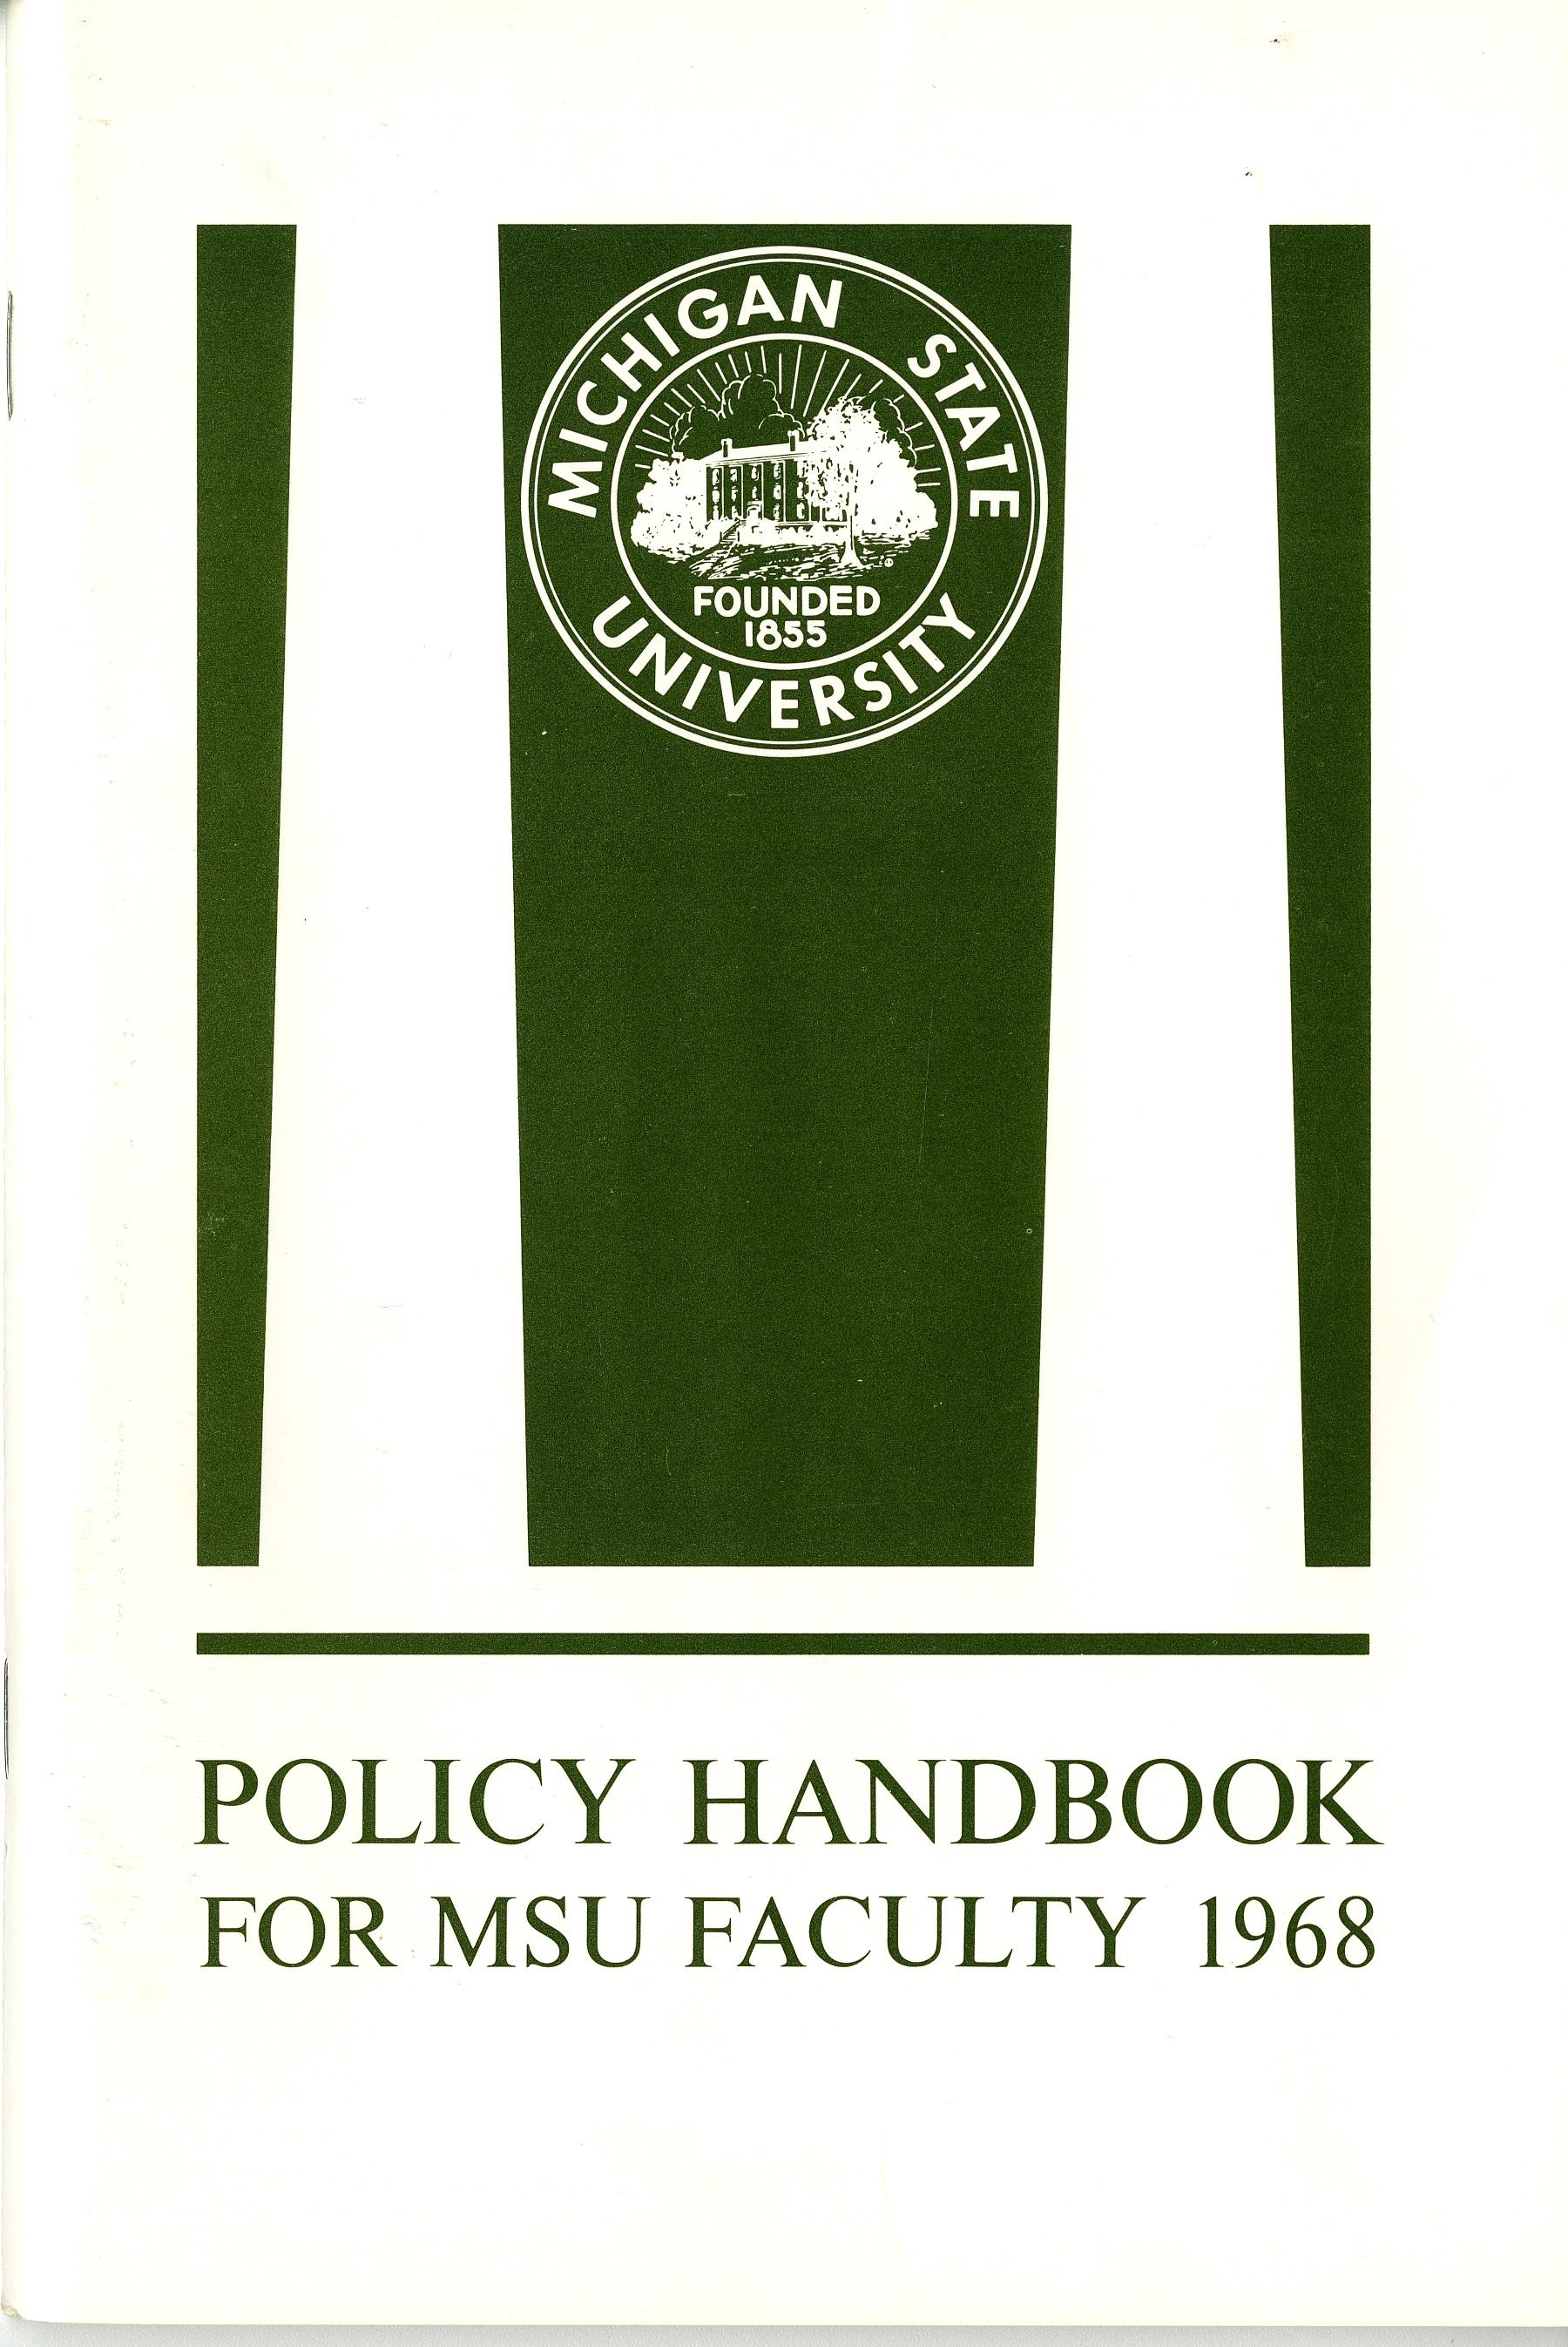 Faculty Handbook, 1968